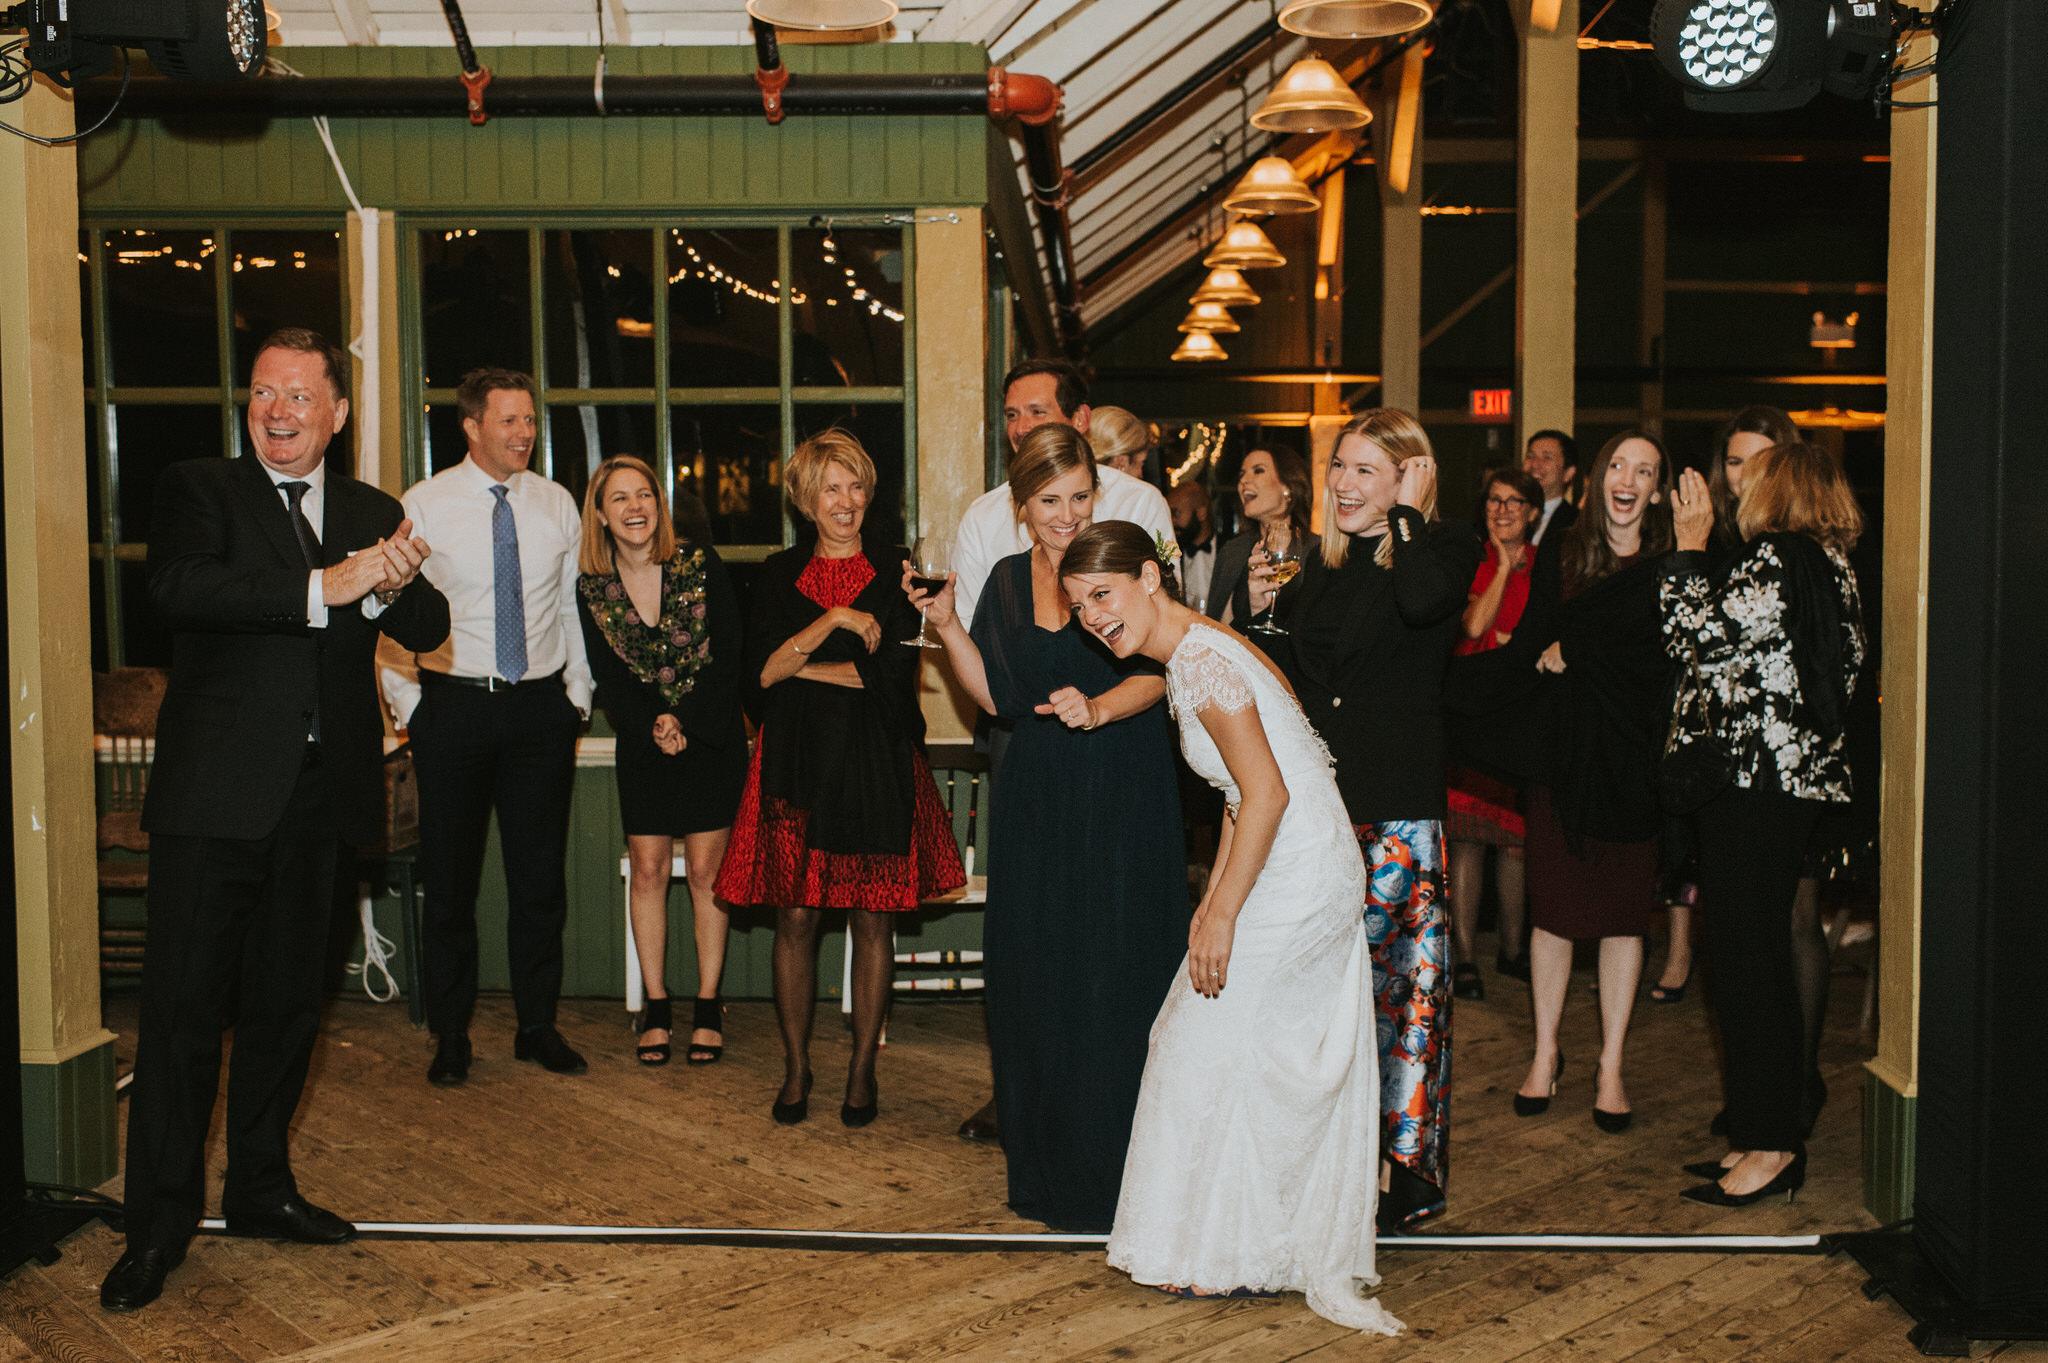 scarletoneillphotography_weddingphotography_prince edward county weddings170.JPG